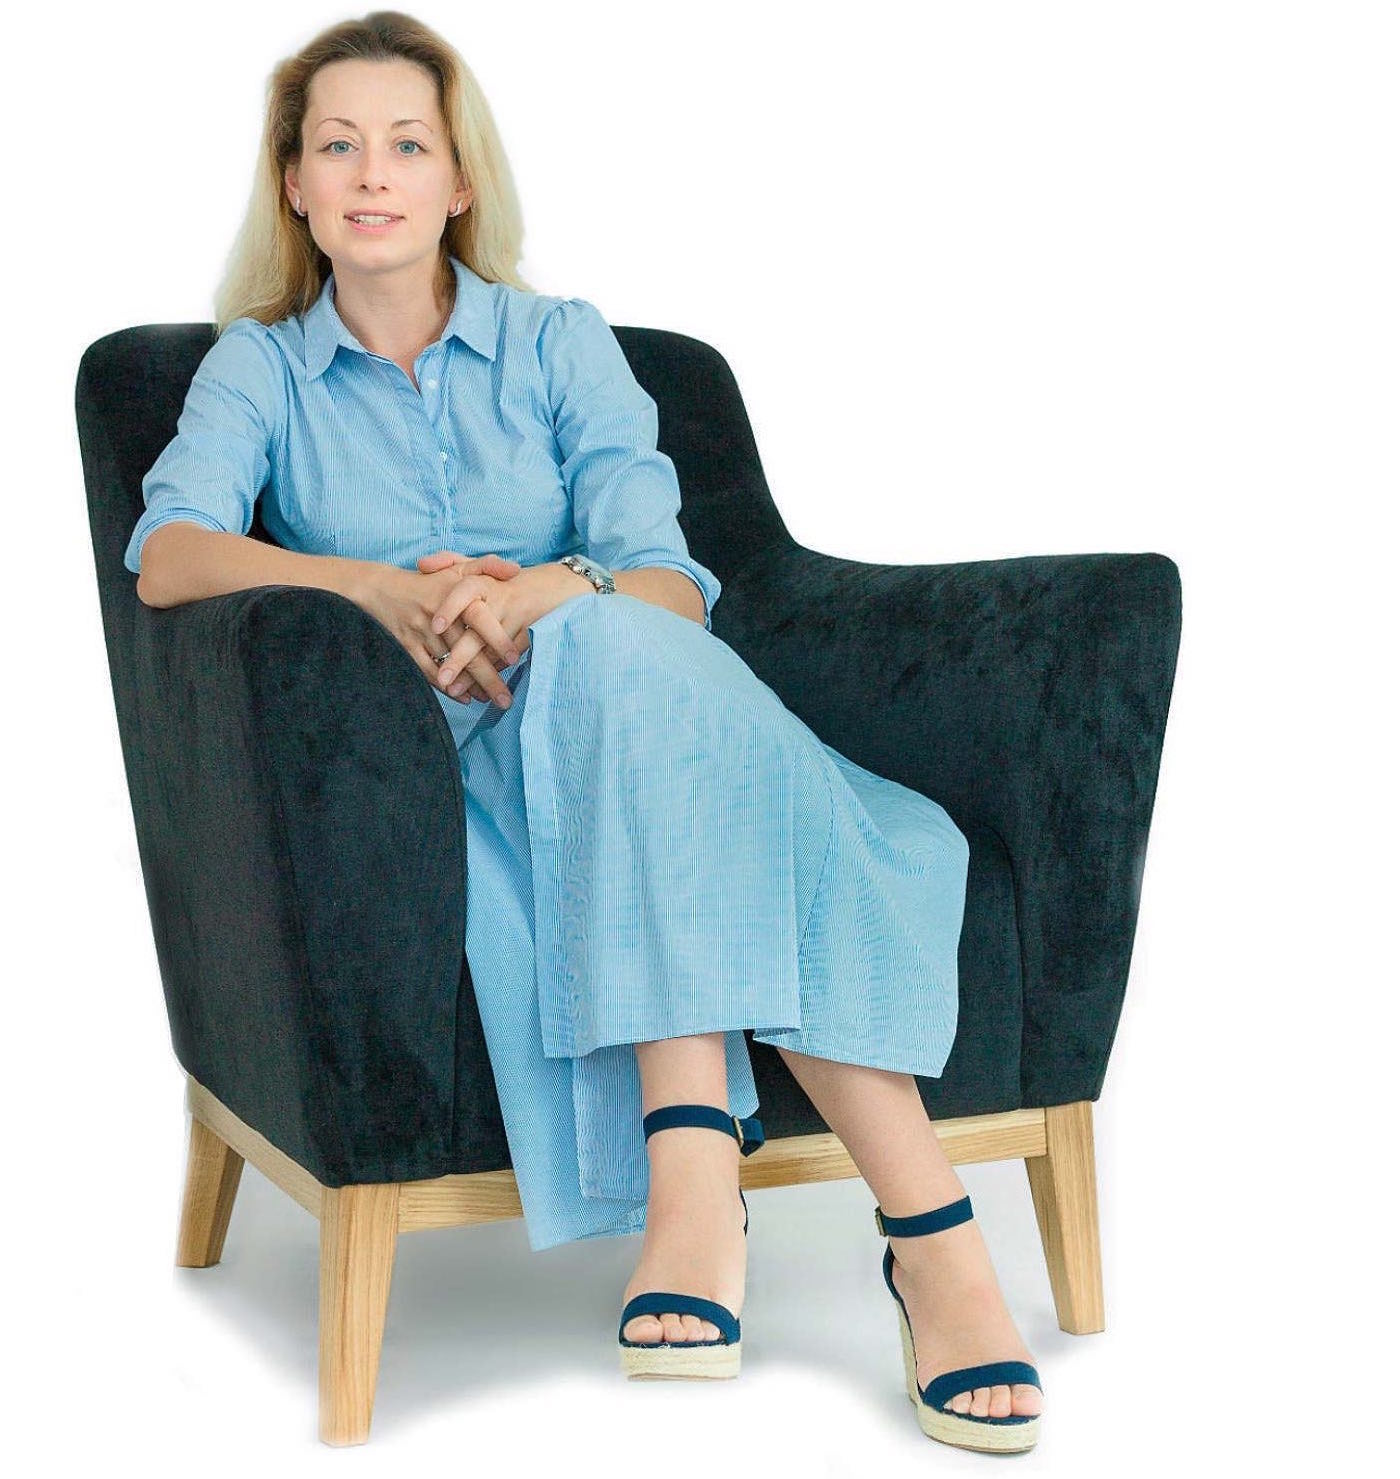 Психолог Надежда Табакаова